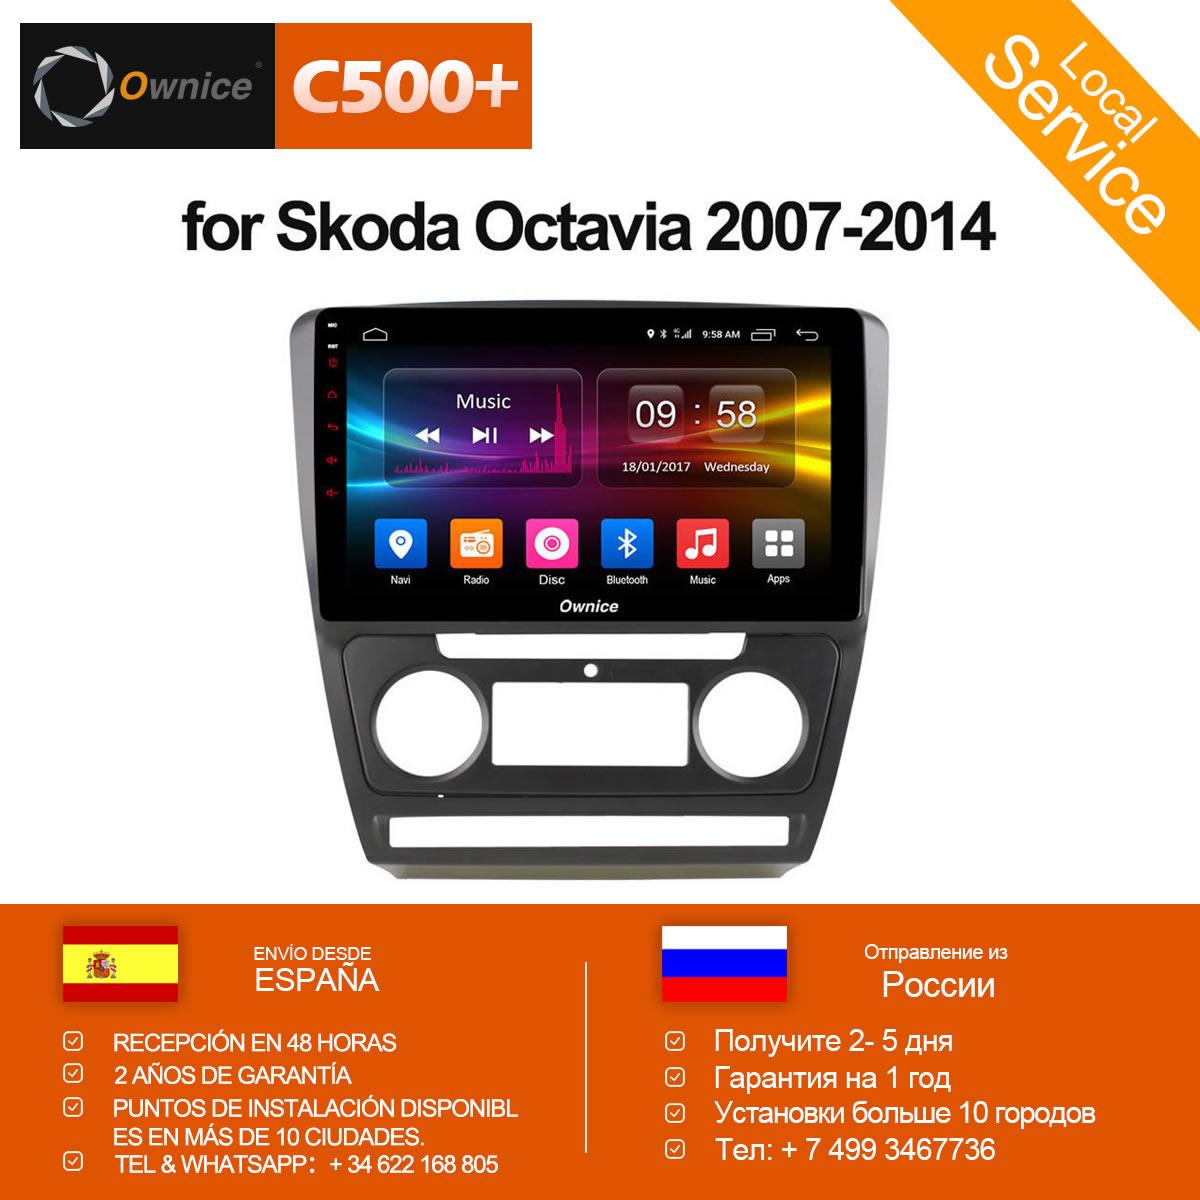 Ownice c500+ G10 Octa core Android 8.1 car dvd GPS Navigation For Skoda Octavia 2007 2008 2009 2010 - 2014 4G DAB+ DVR 2G RAM ownice c500 octa core 10 1 android gps car radio multimedia player 2g 32g for skoda octavia 2014 2015 2016 2017 dvd 4g lte pc